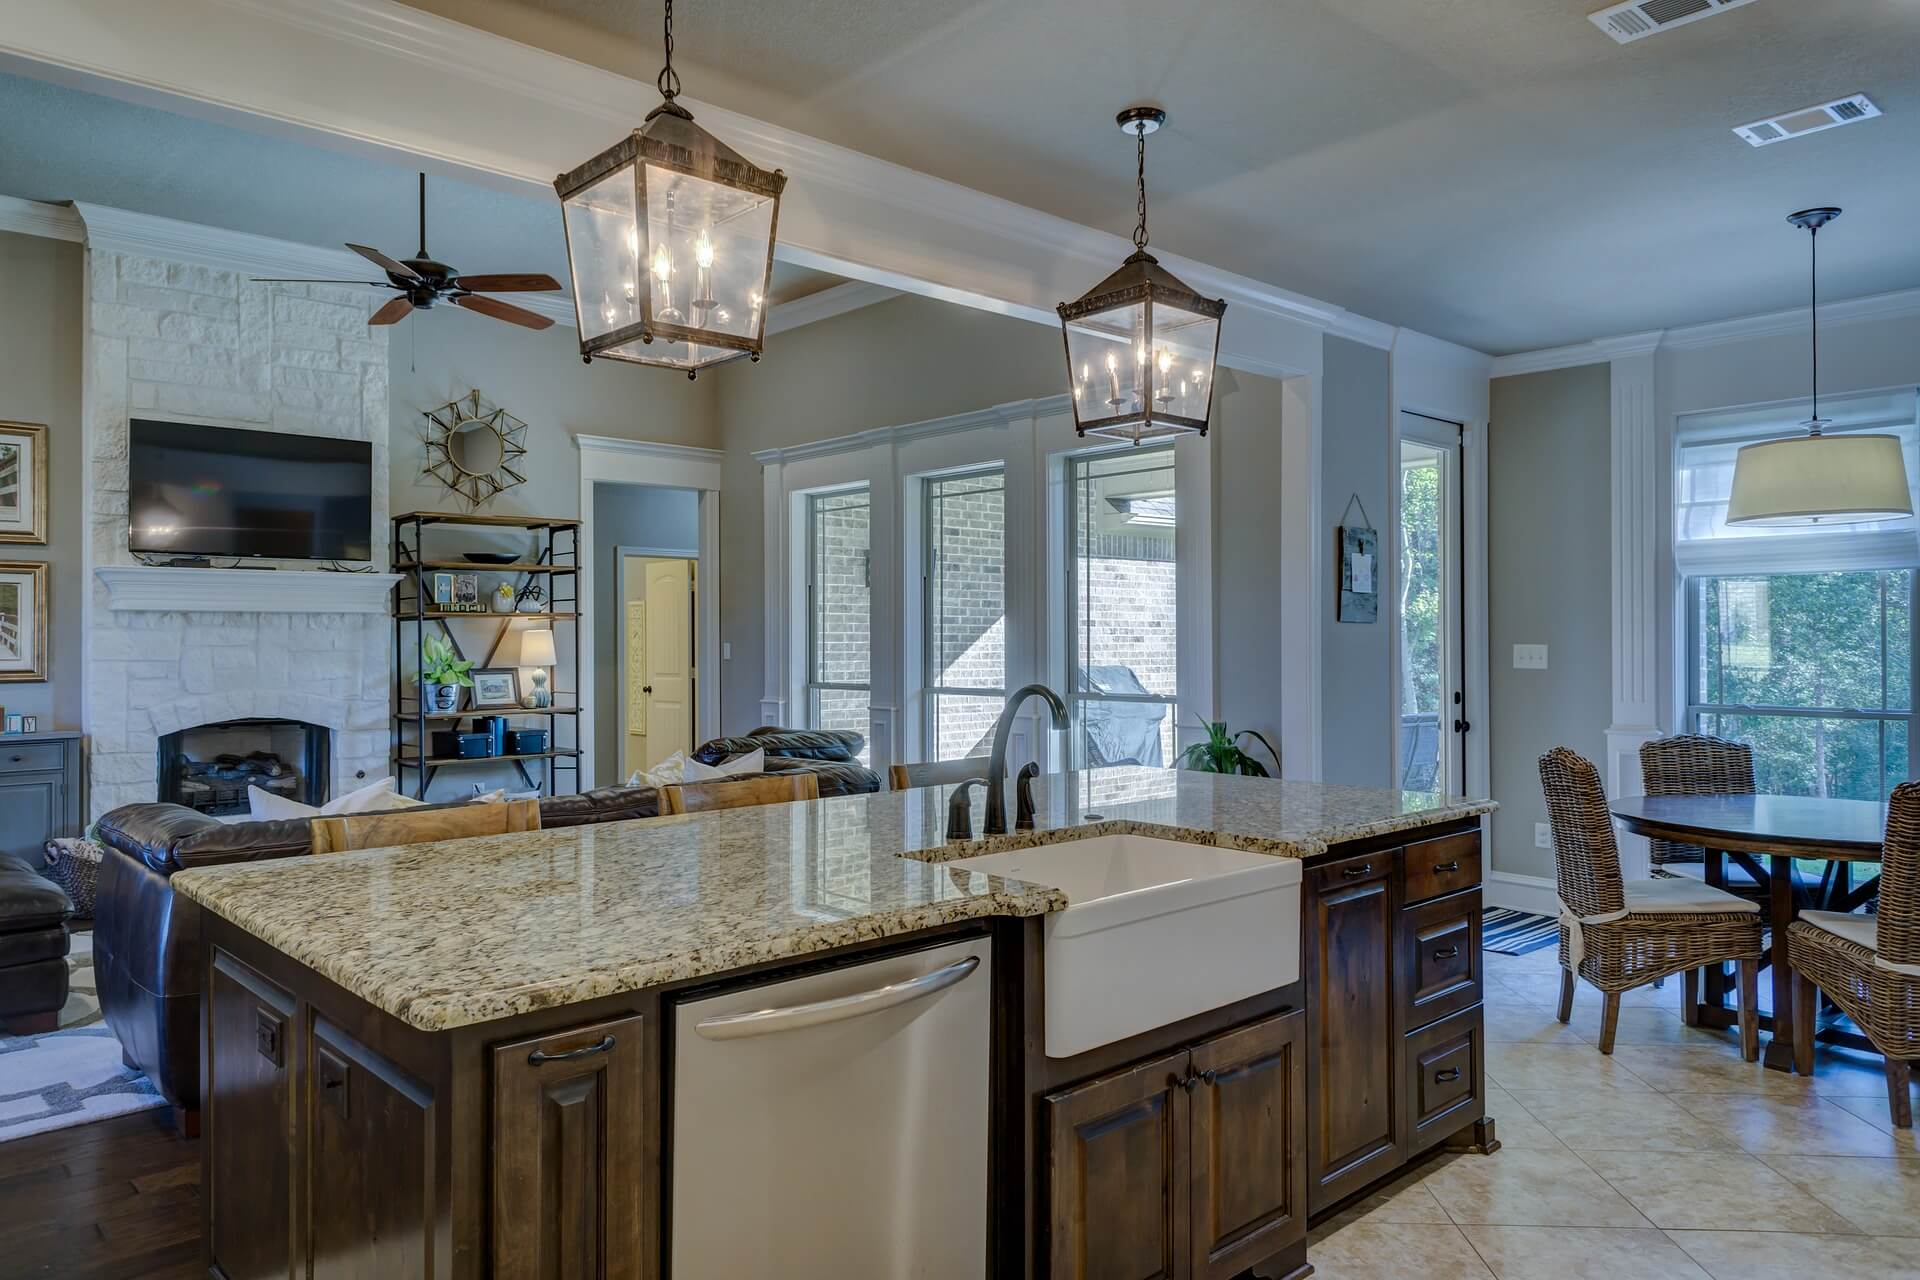 Luxury Kitchen Designs - SoFlo Kitchen Remodeling & Custom Cabinet Installation - backsplashes, flooring, countertops